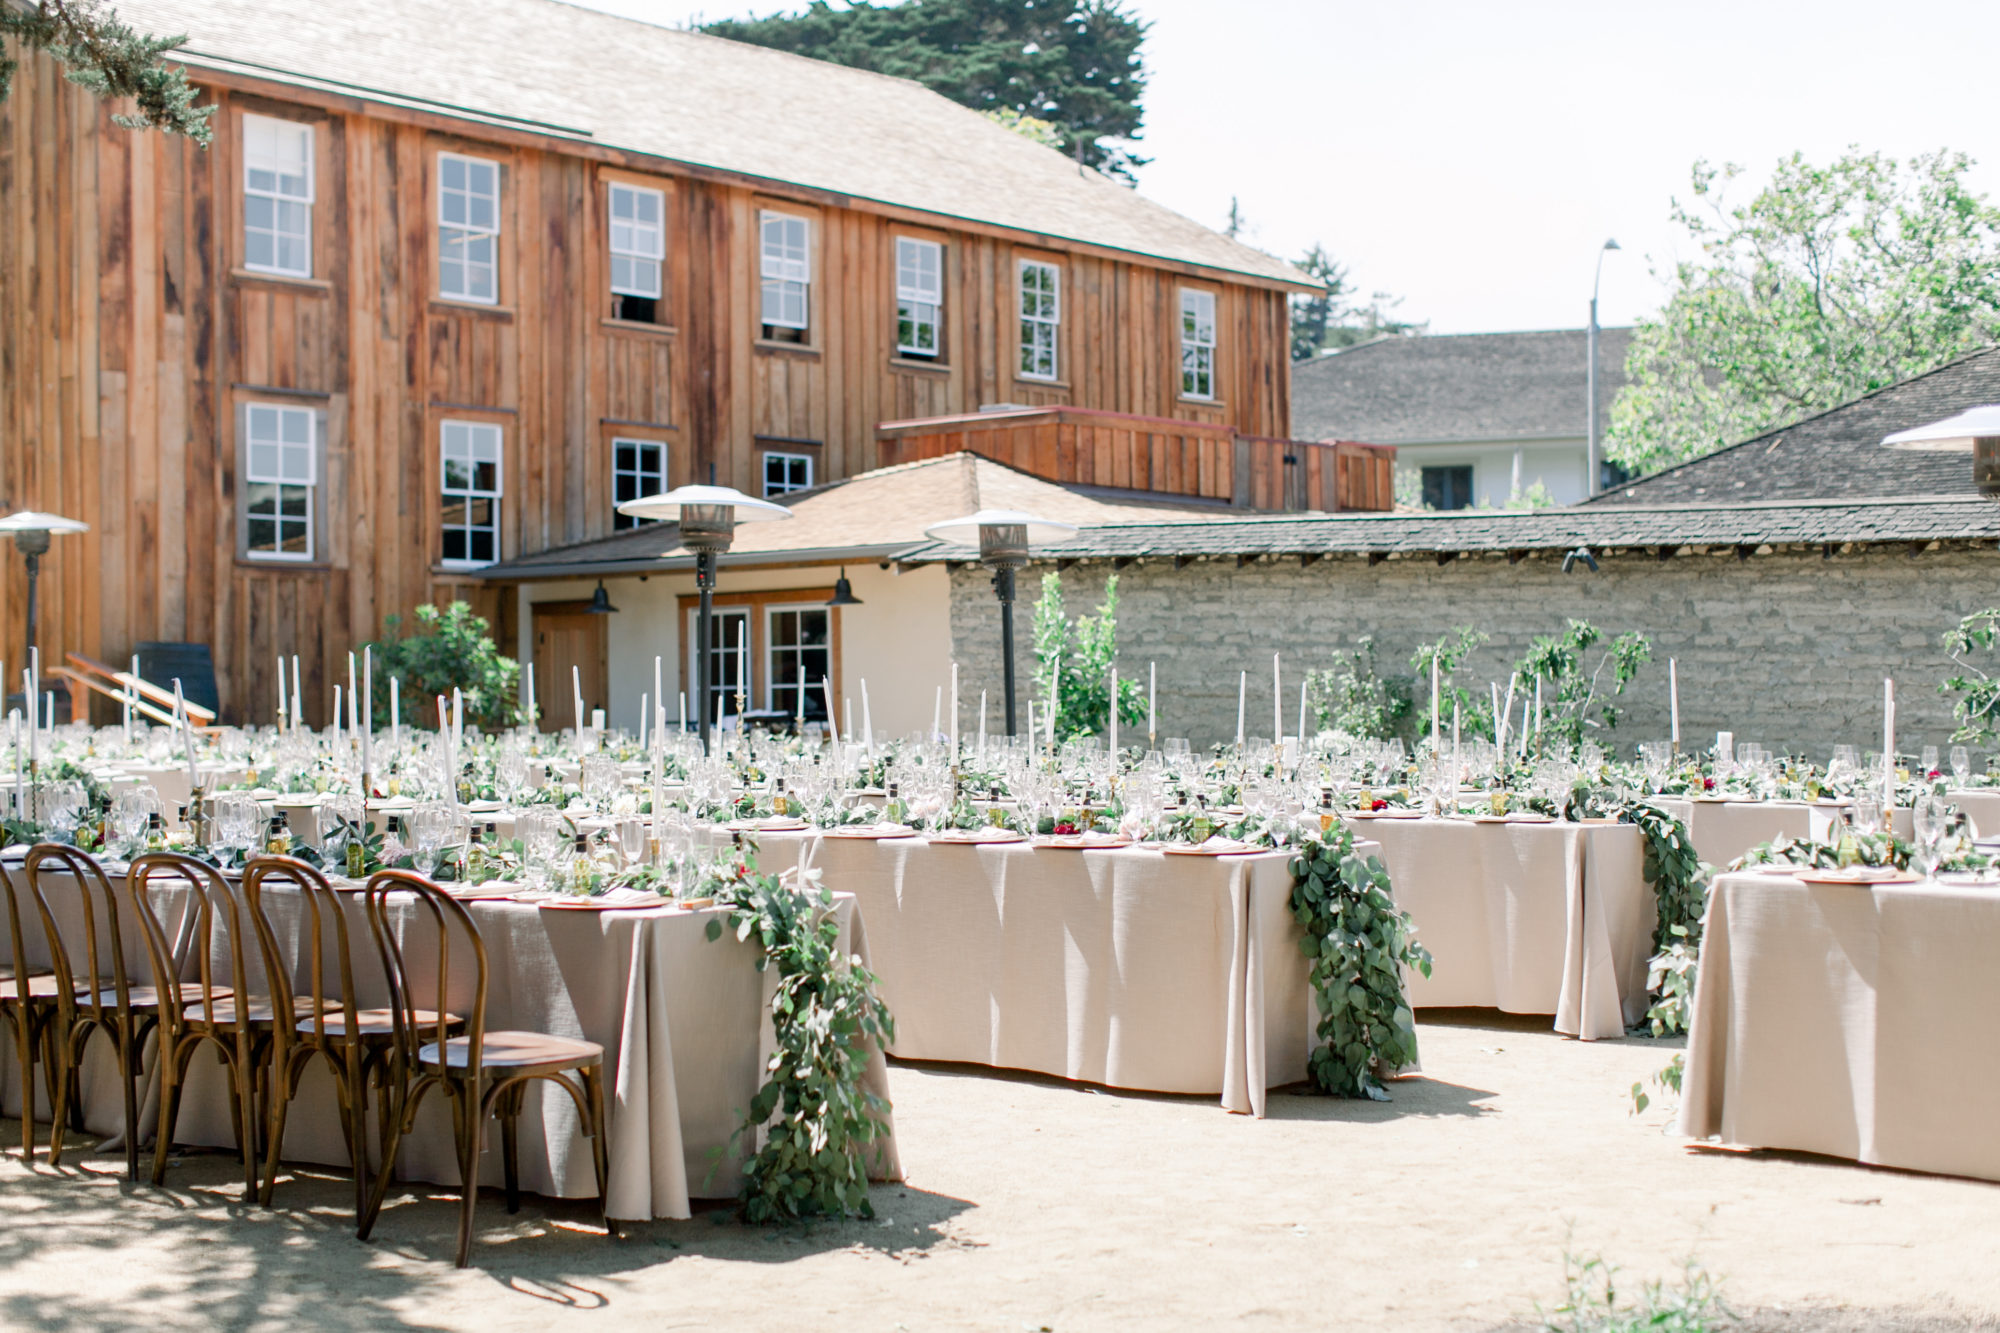 Ourdoor dining set up for wedding reception at Cooper Molera Barns Monterey